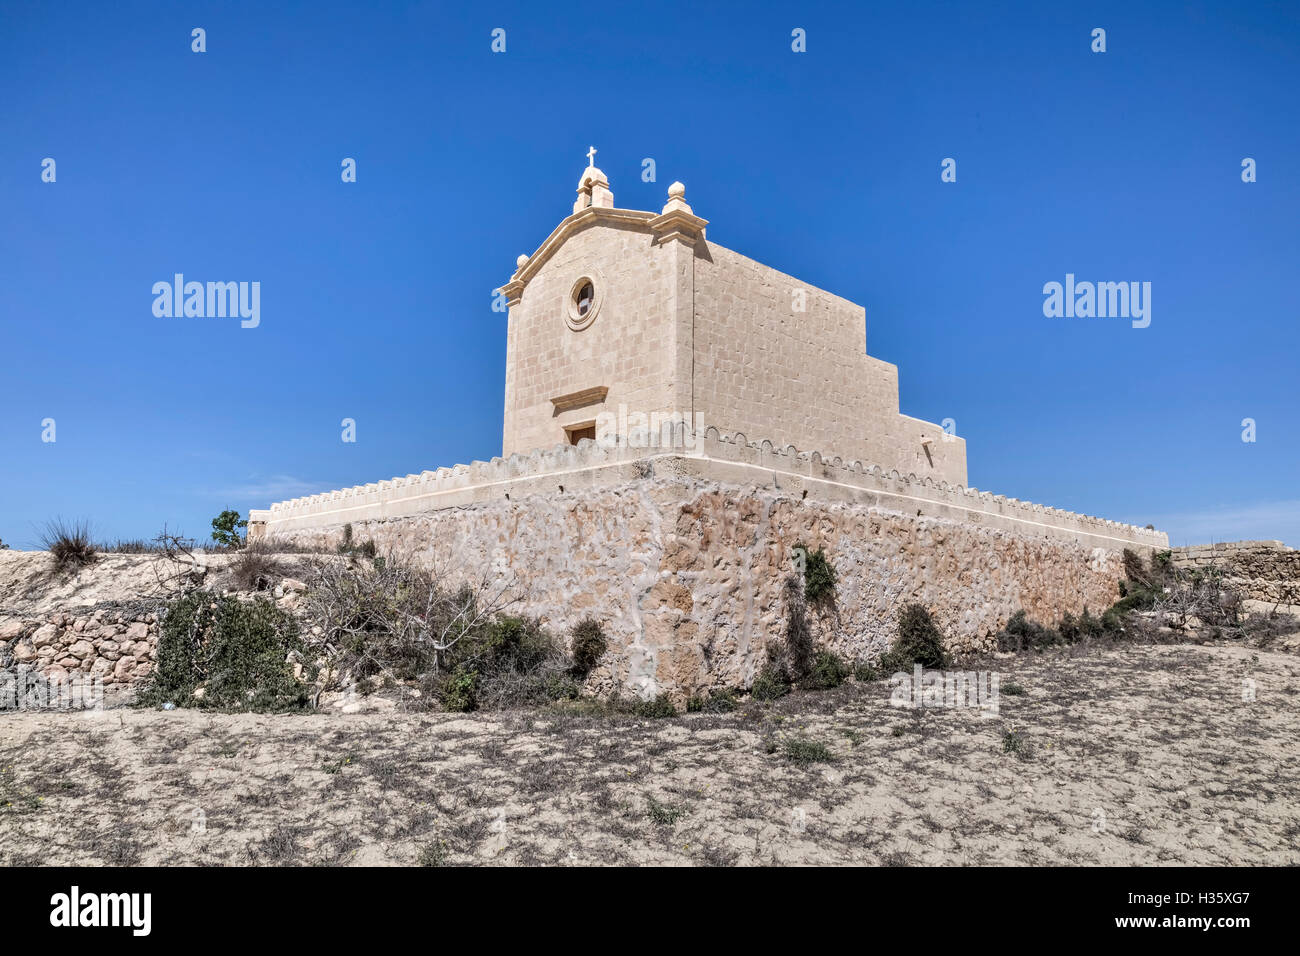 San Dimitri Chapel, Gharb, Gozo, Malta - Stock Image